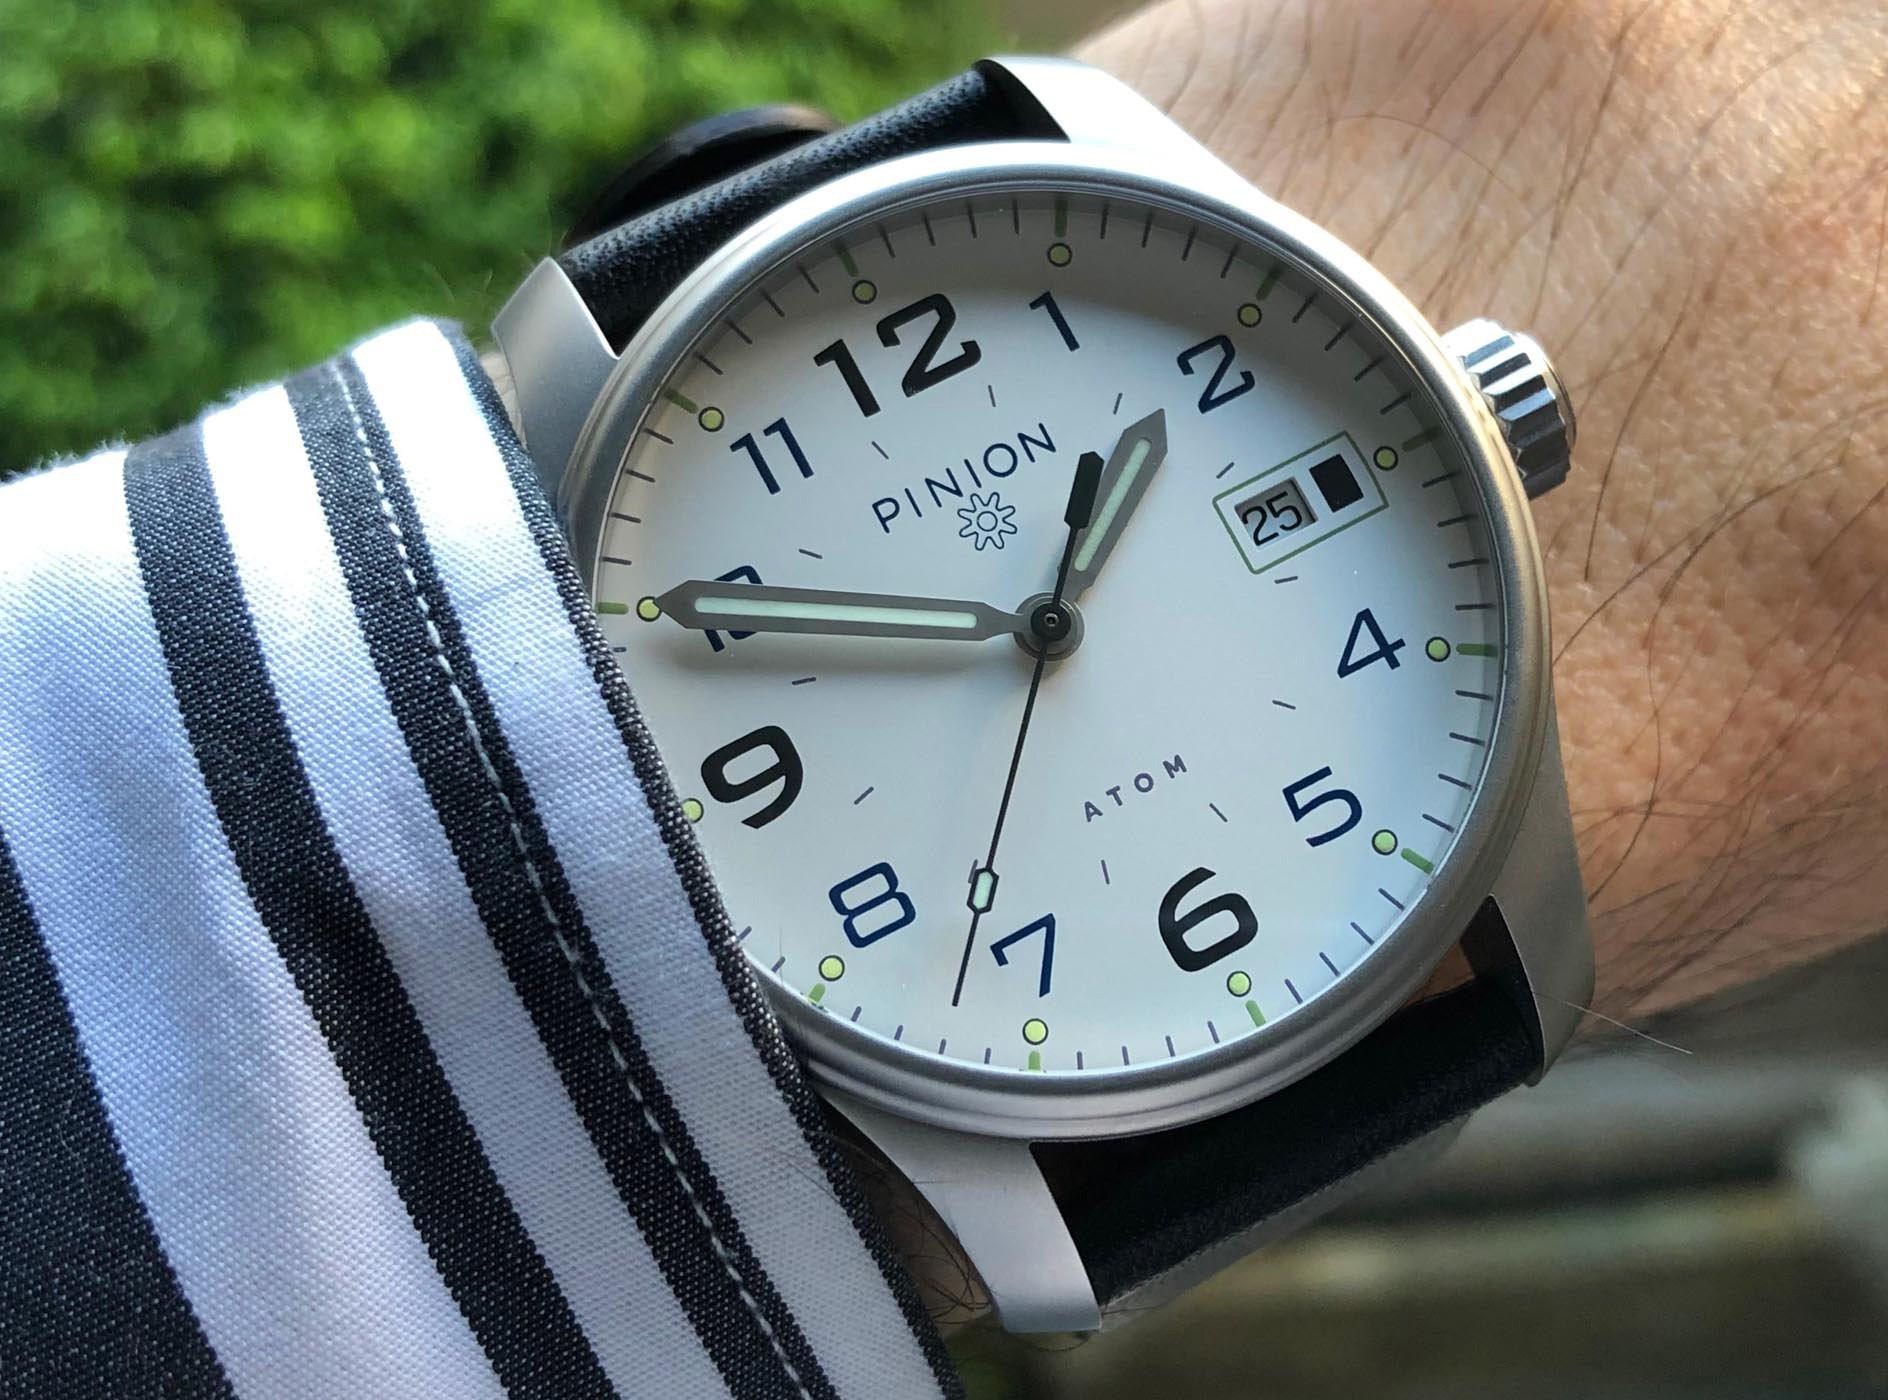 Pinion Atom 39 on the wrist